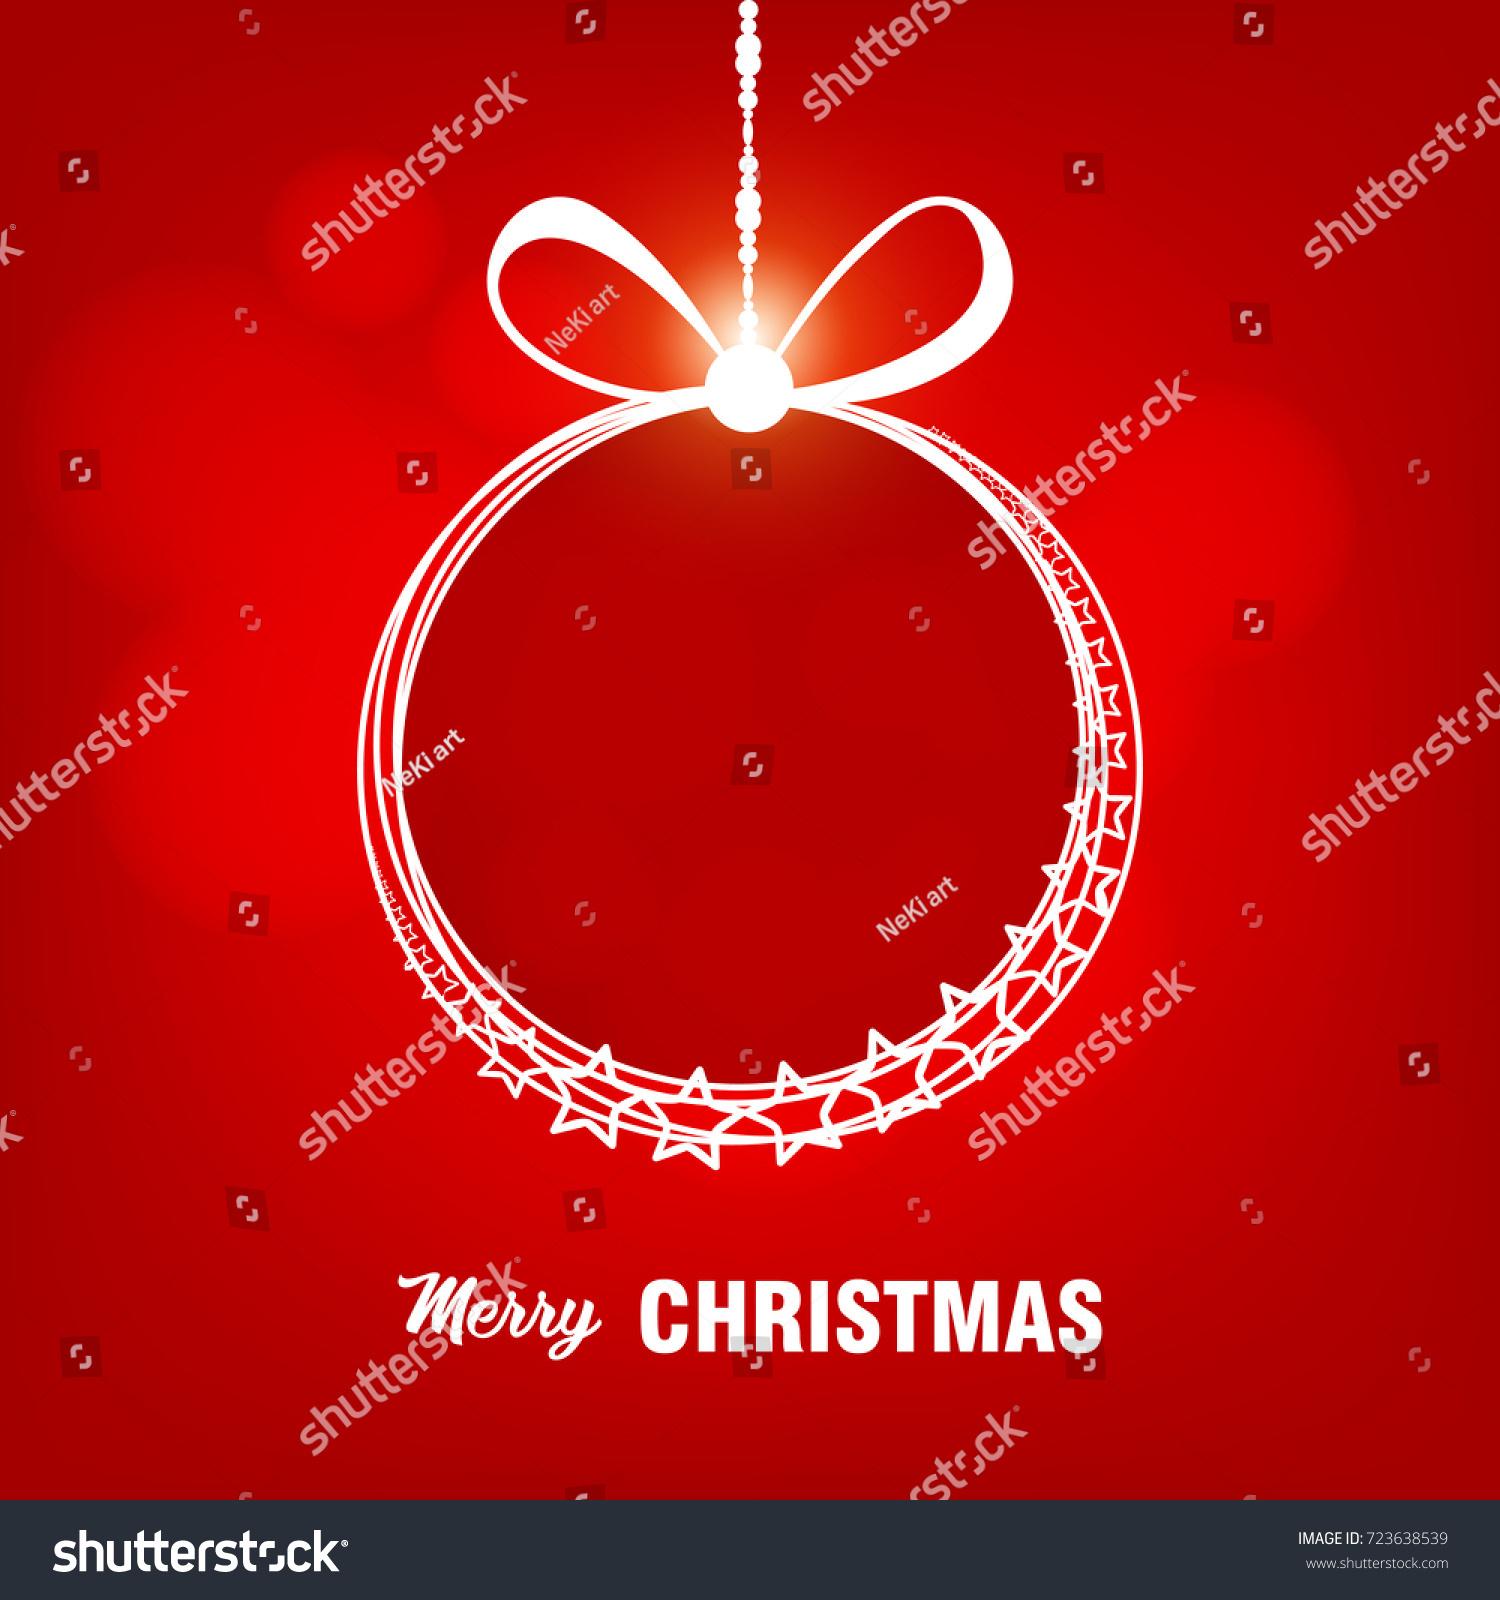 Merry christmas everyone vintage frame design stock vector royalty merry christmas everyone vintage frame design for xmas greeting card flyer poster m4hsunfo